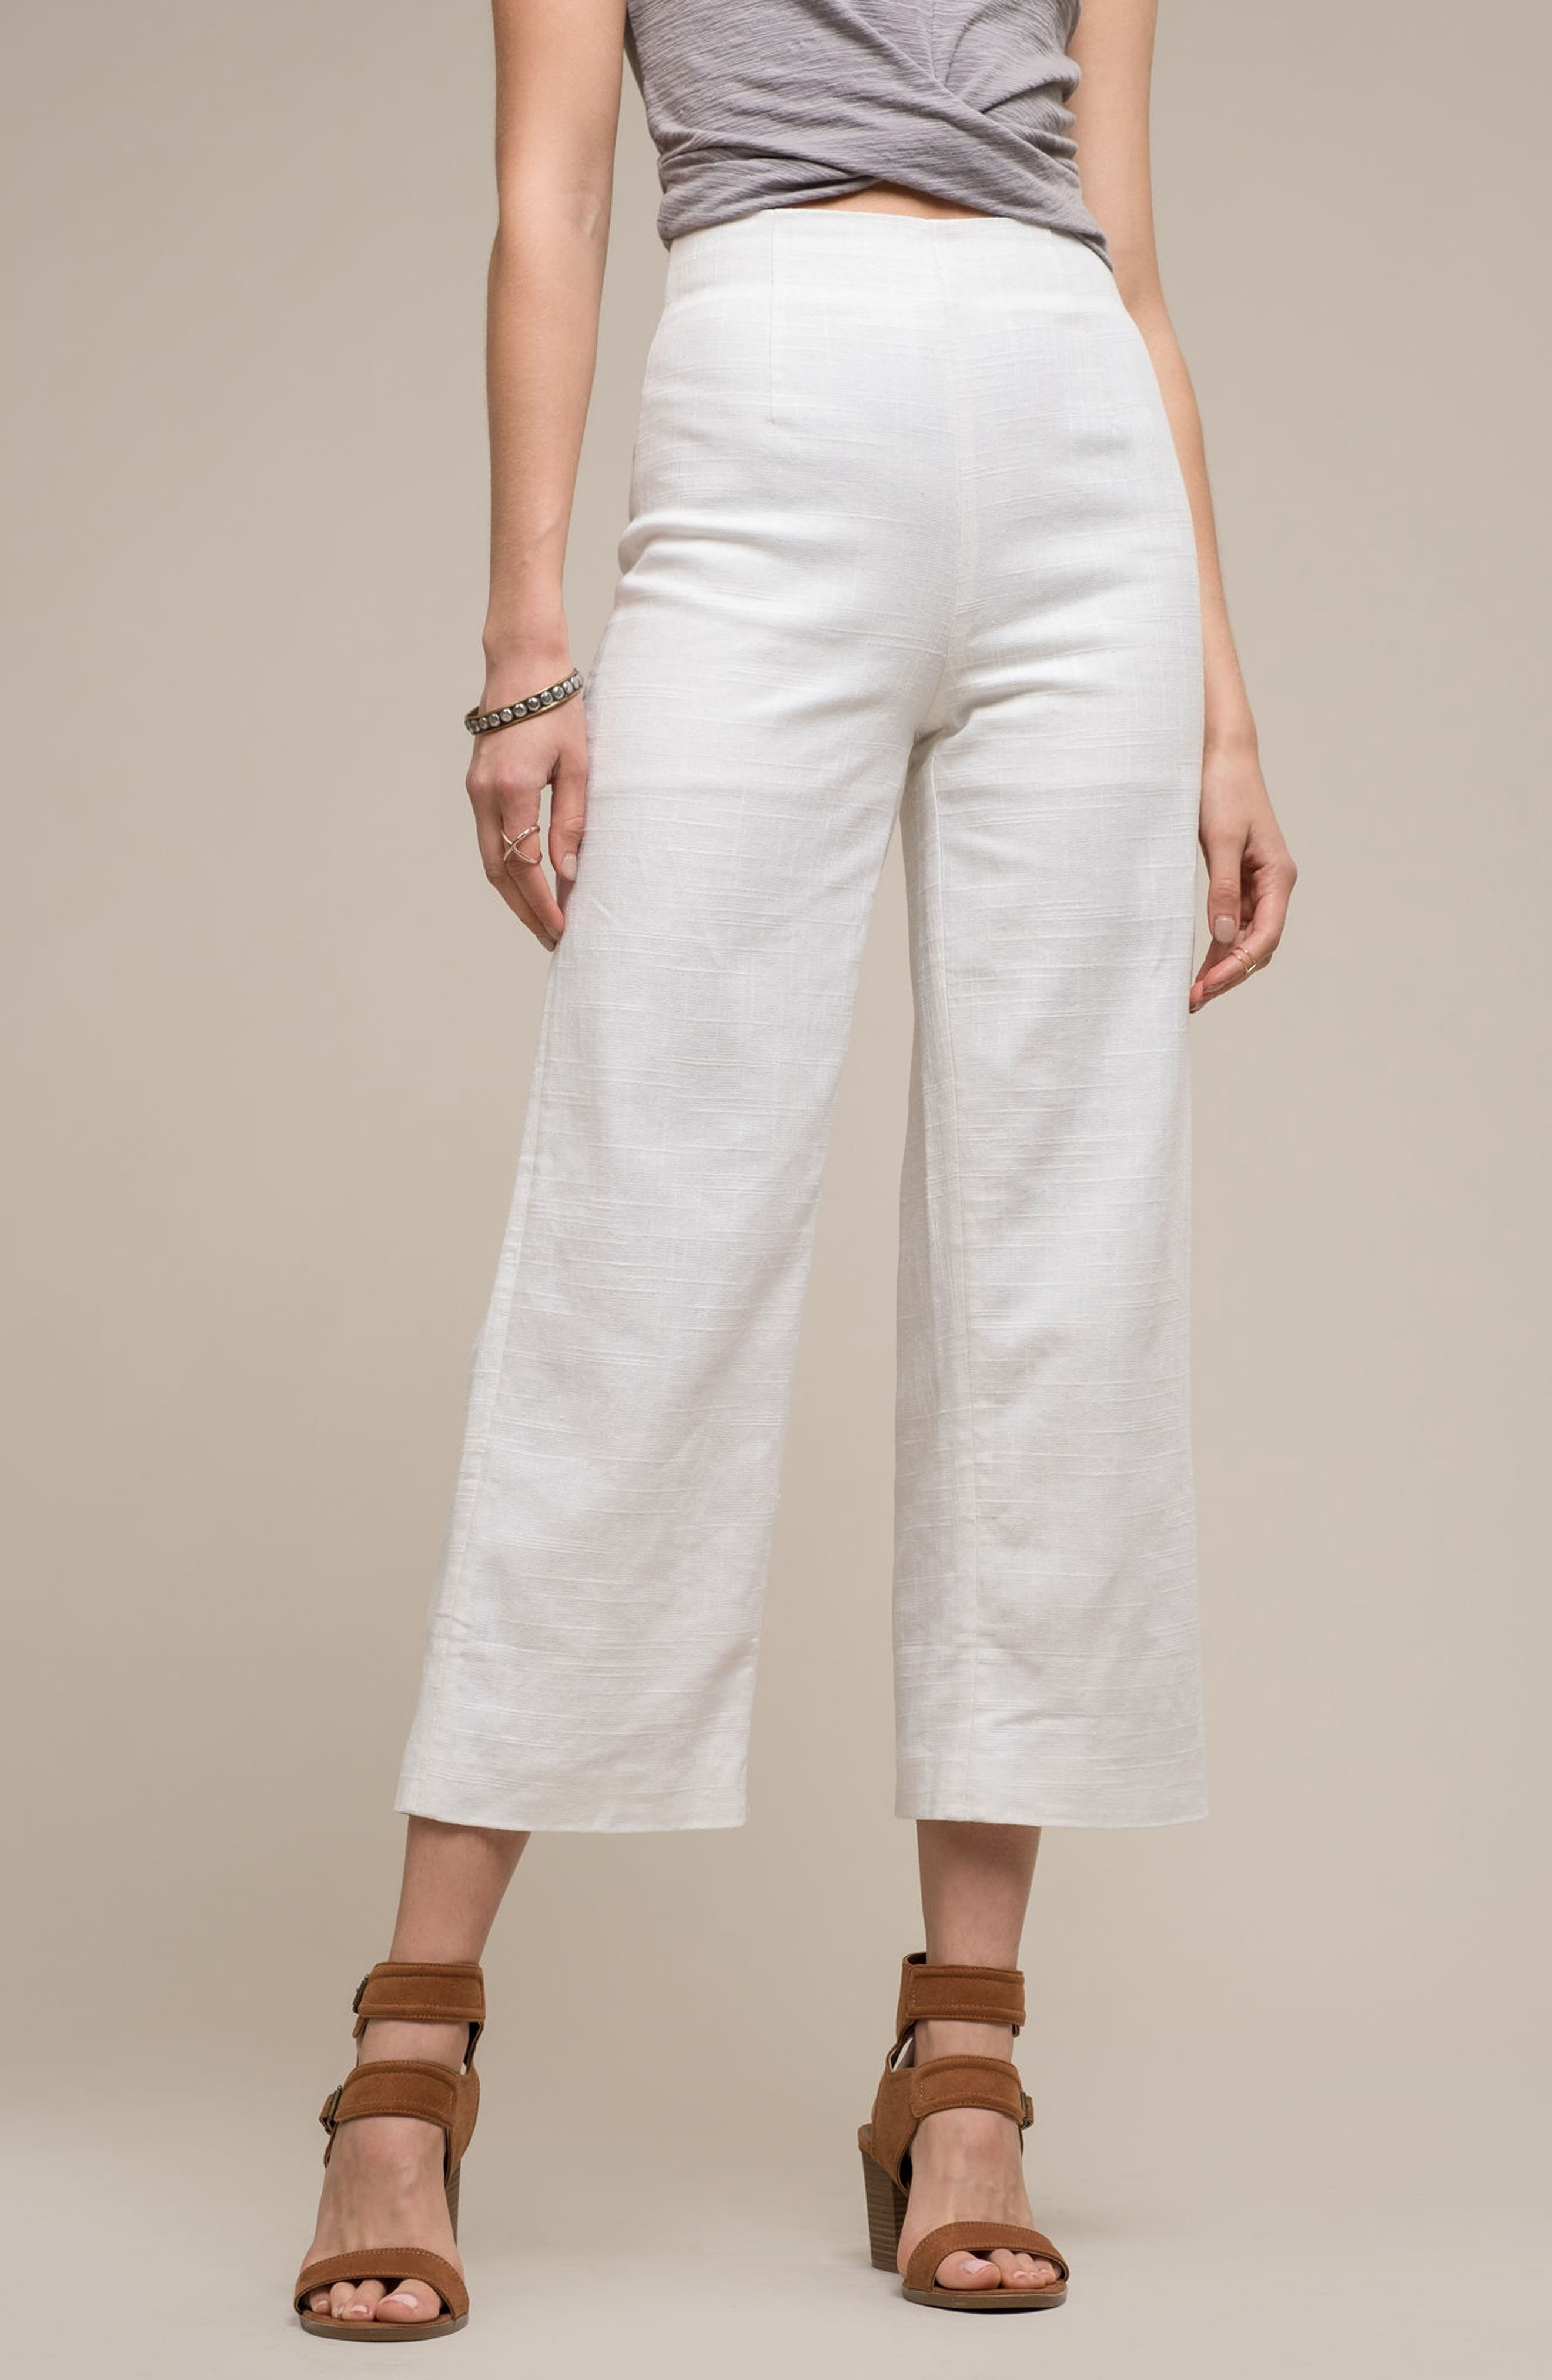 Linen High Waist Crop Pants,                             Alternate thumbnail 2, color,                             White